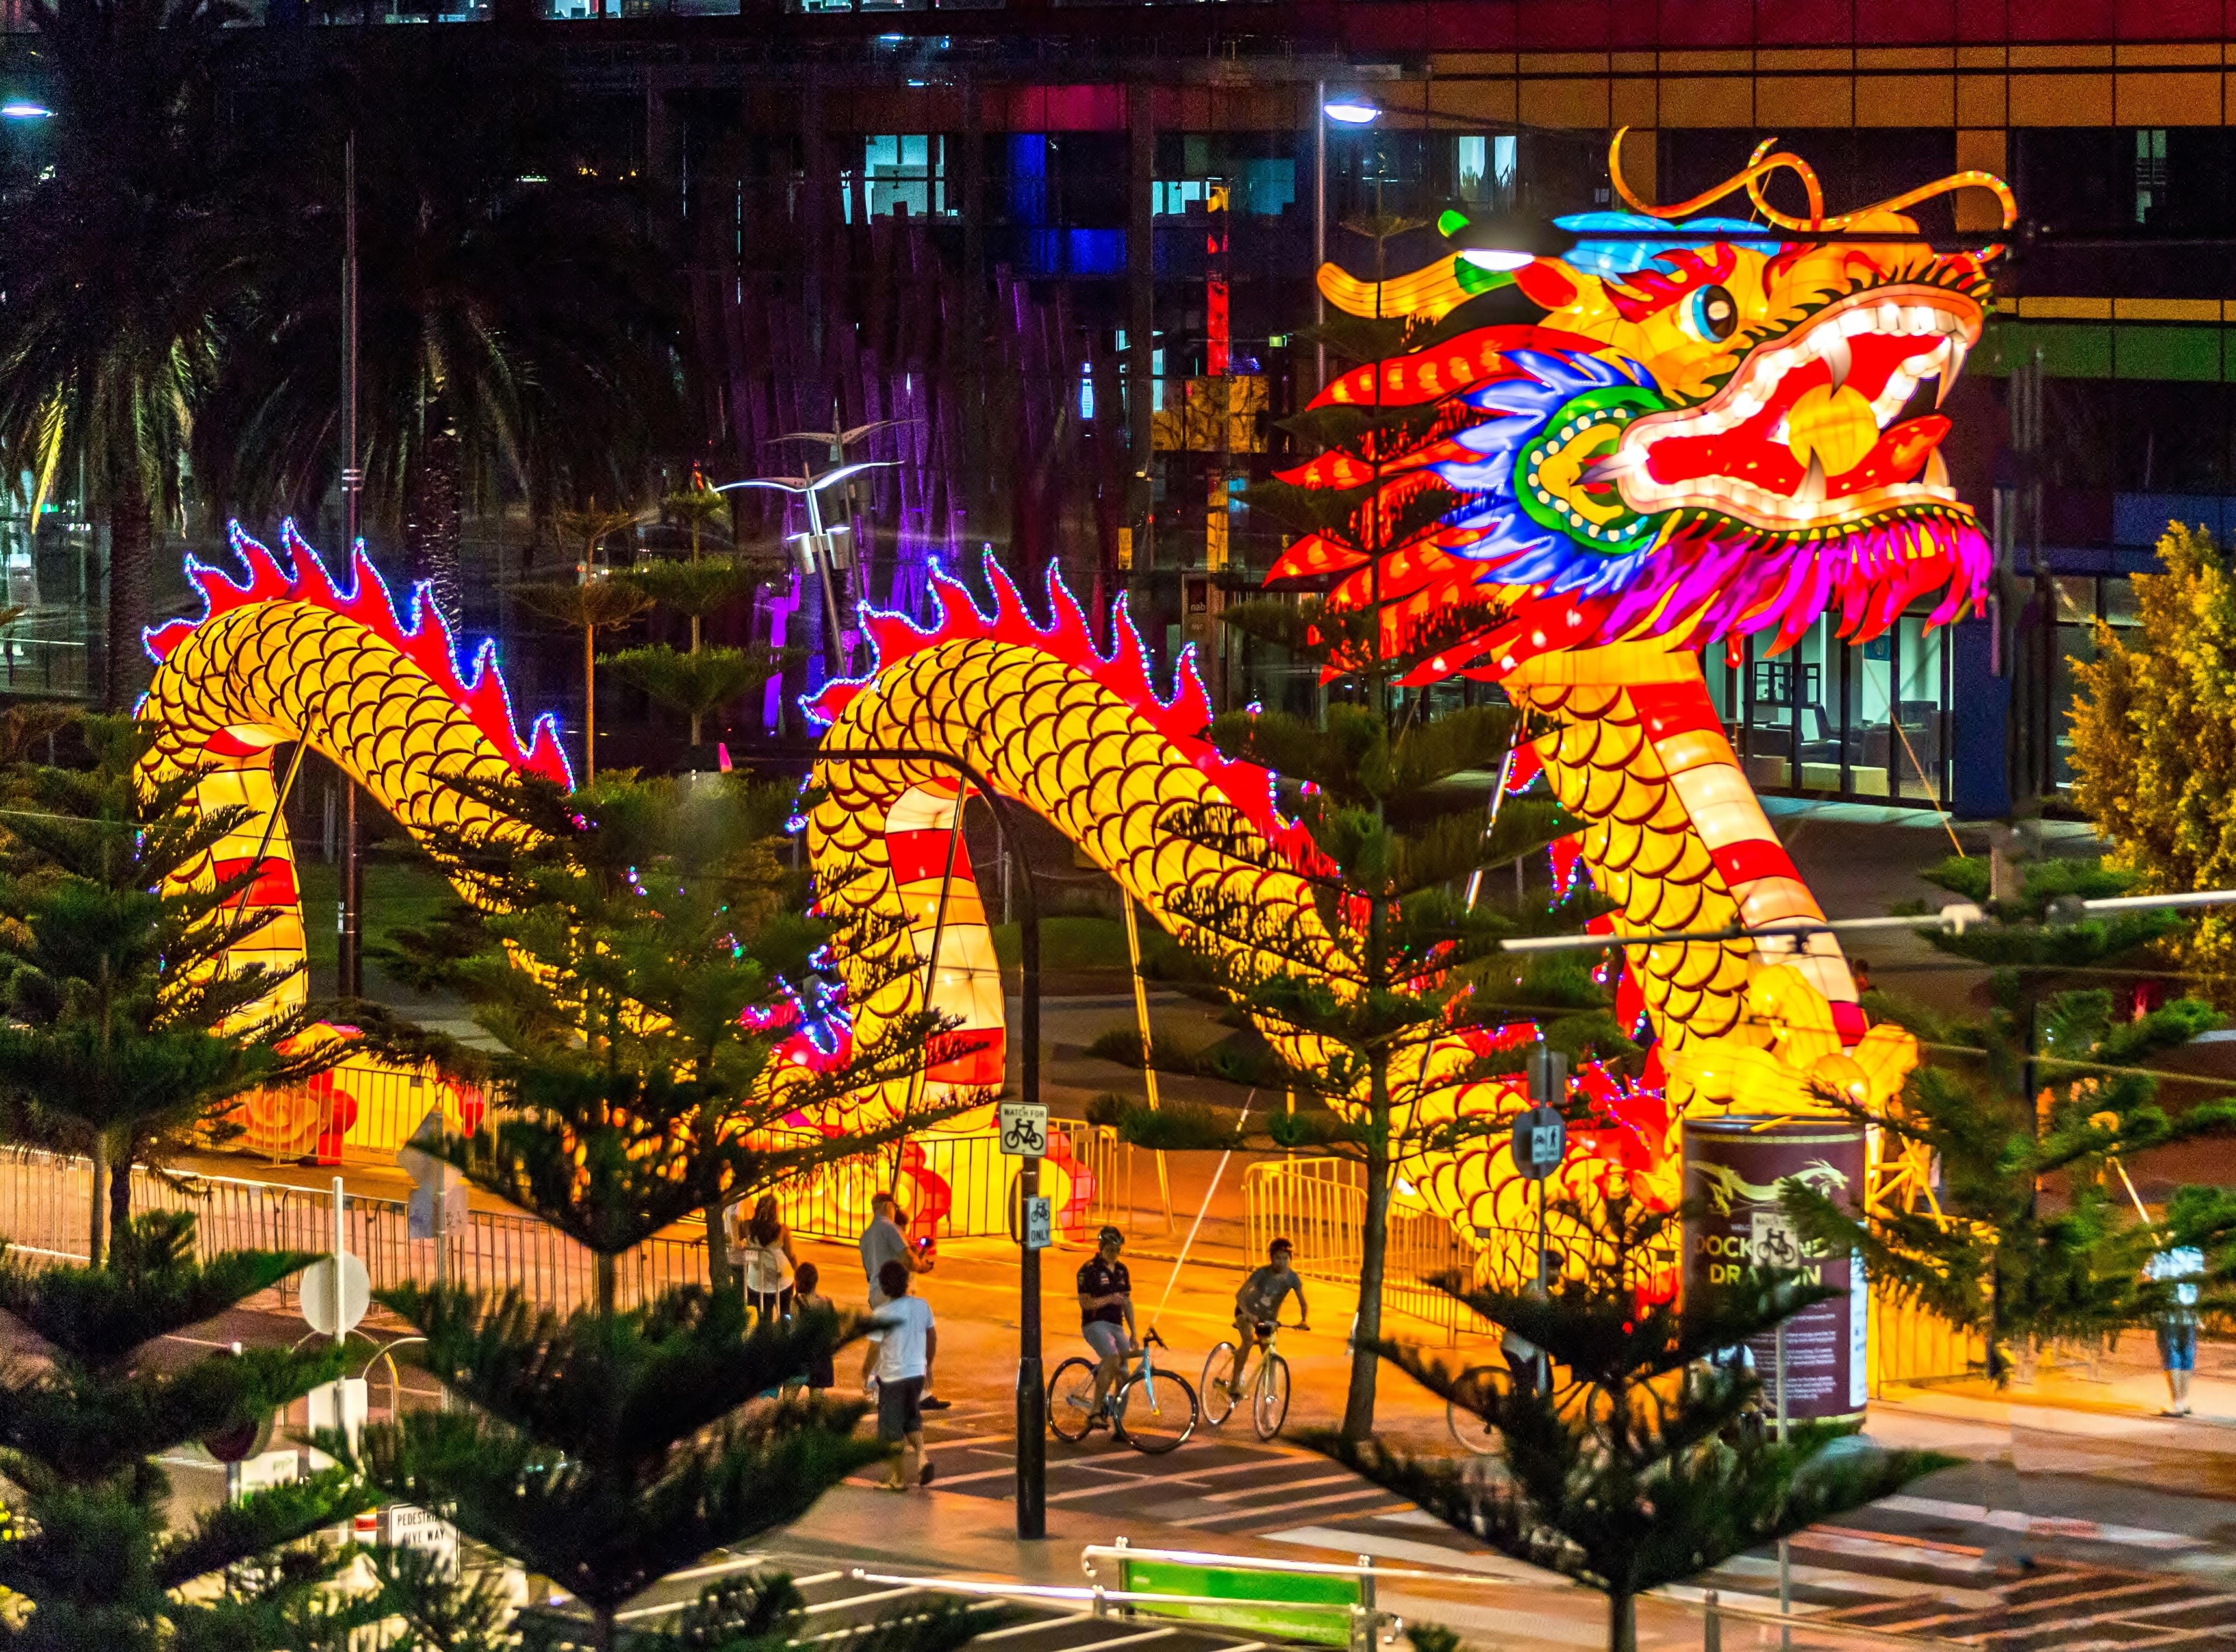 File:Chinese new year dragon 2014.jpg - Wikimedia Commons